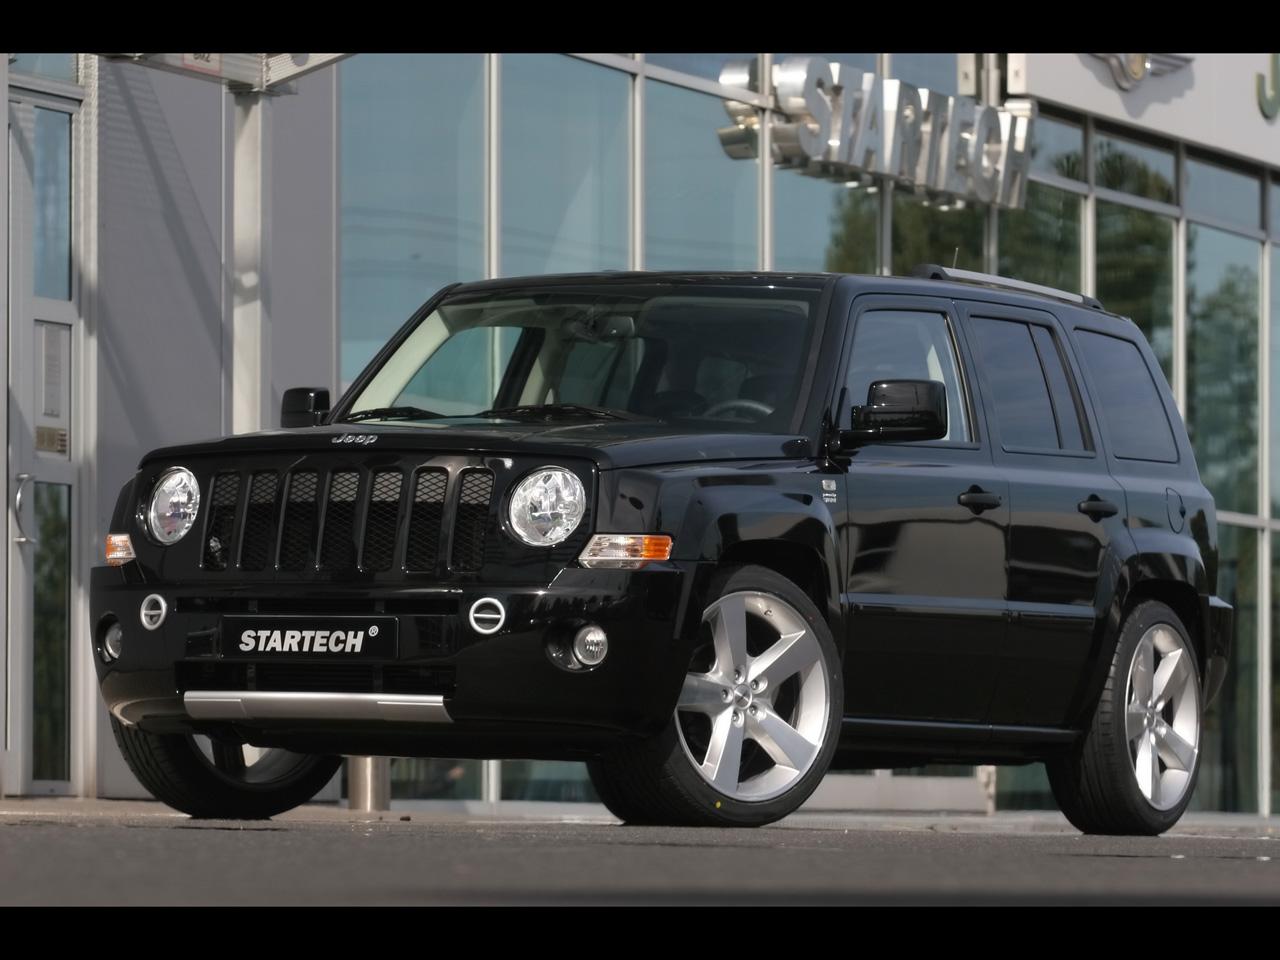 2007 BRABUS STARTECH Jeep Patriot